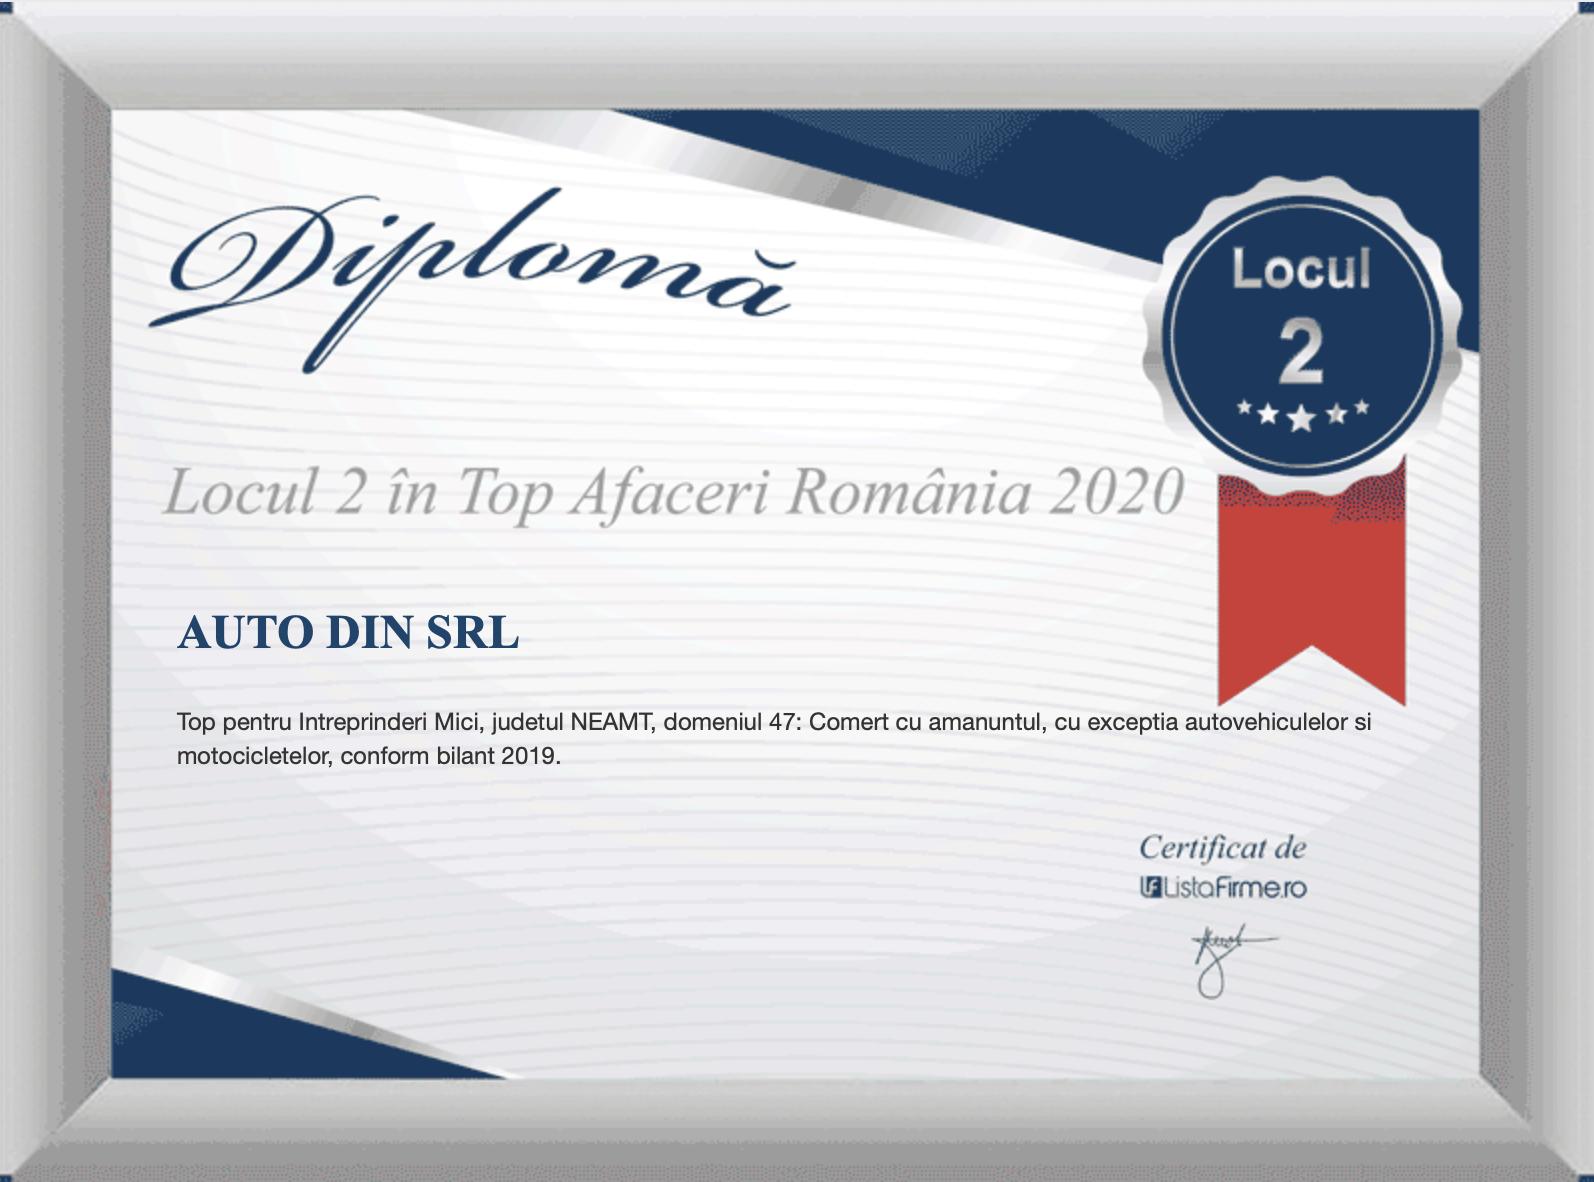 DiplomaAutoDin2020-2